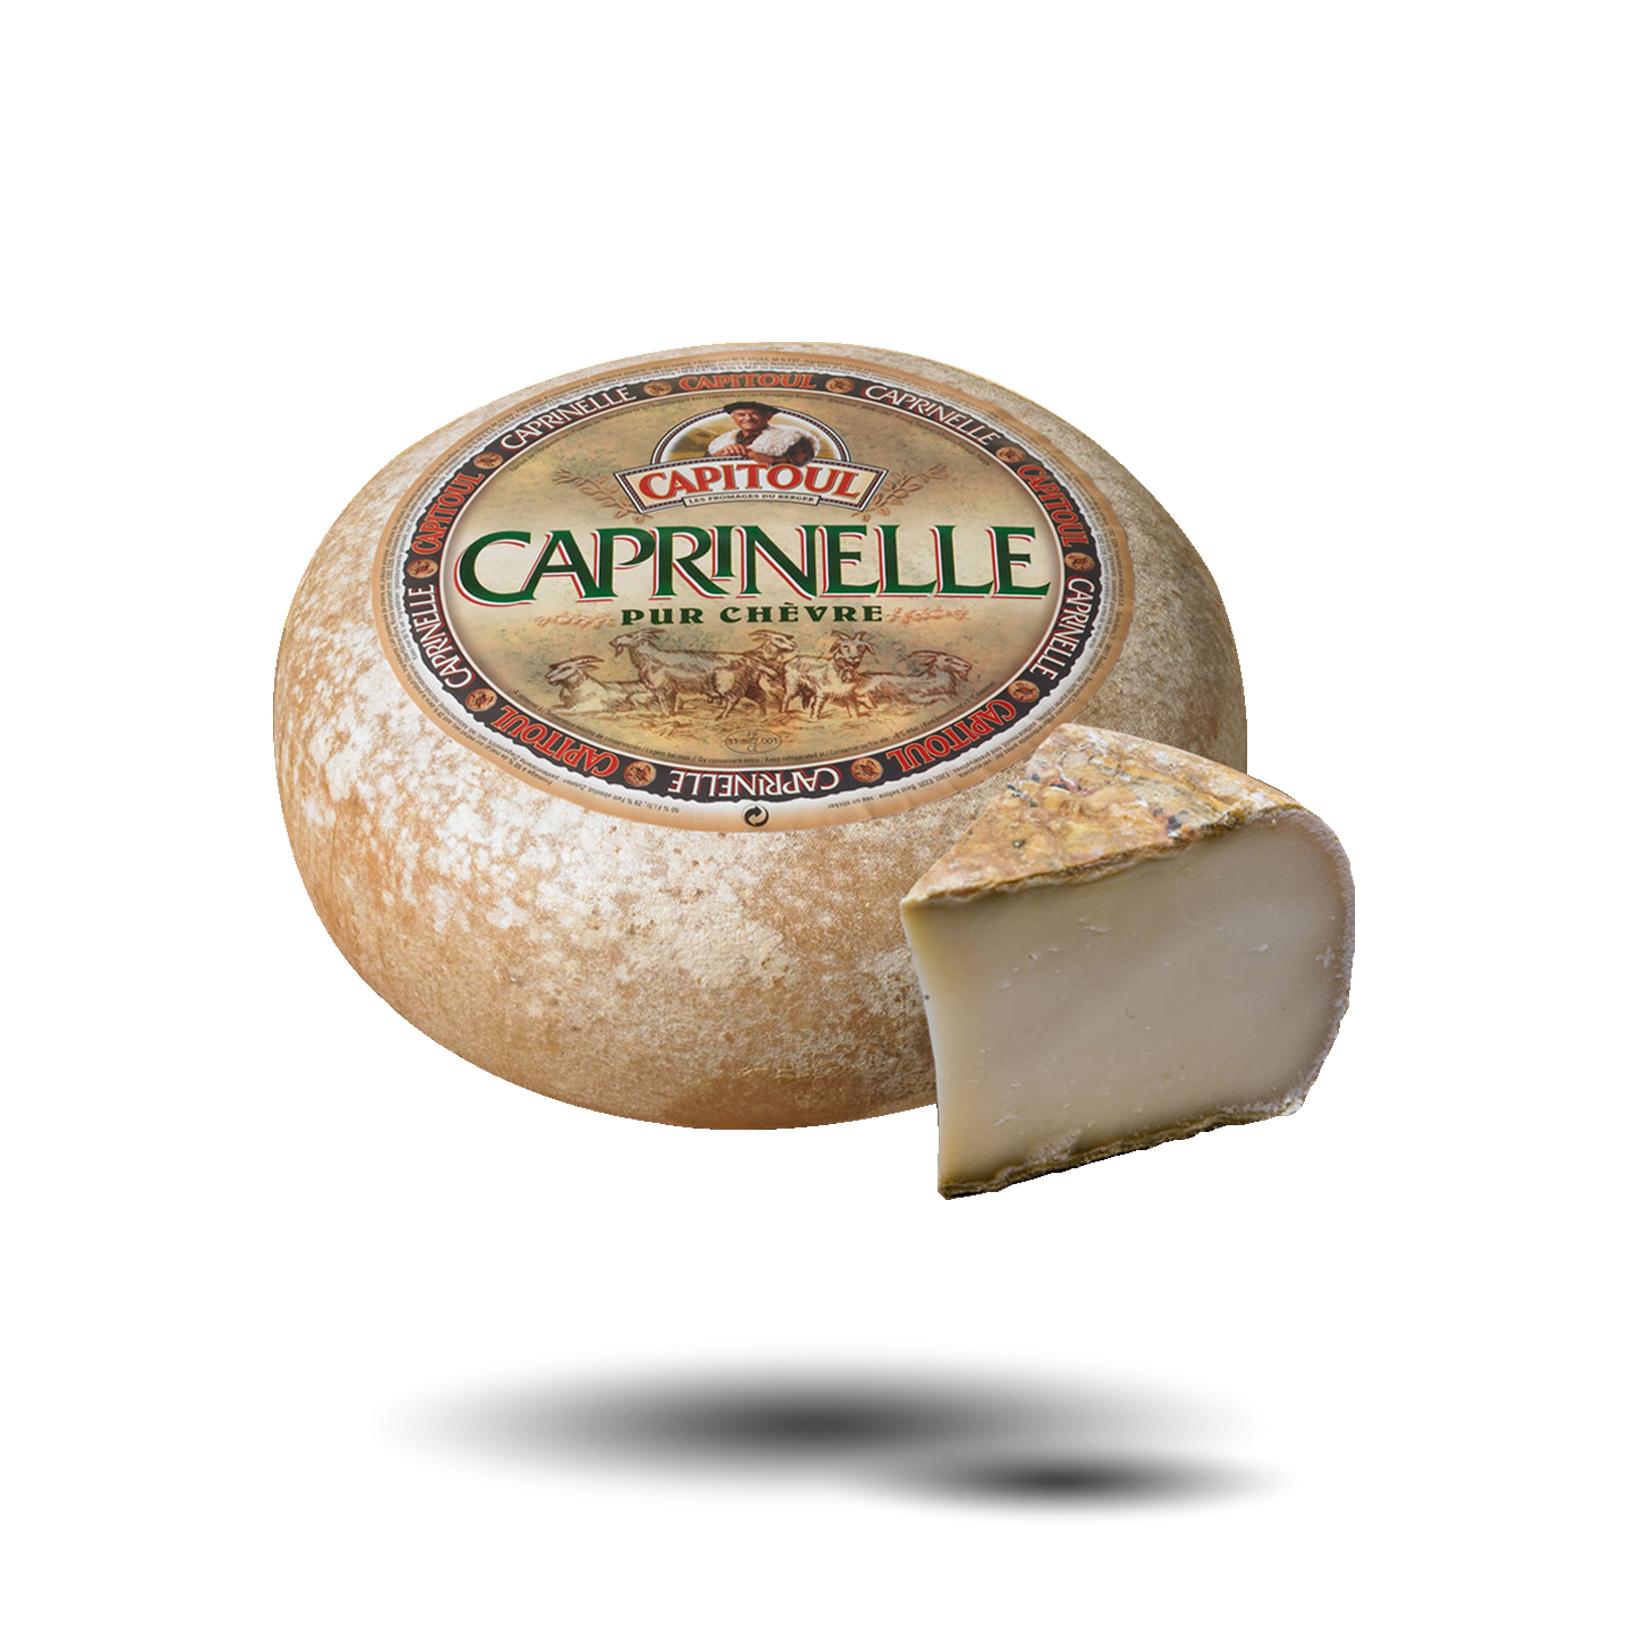 Caprinelle